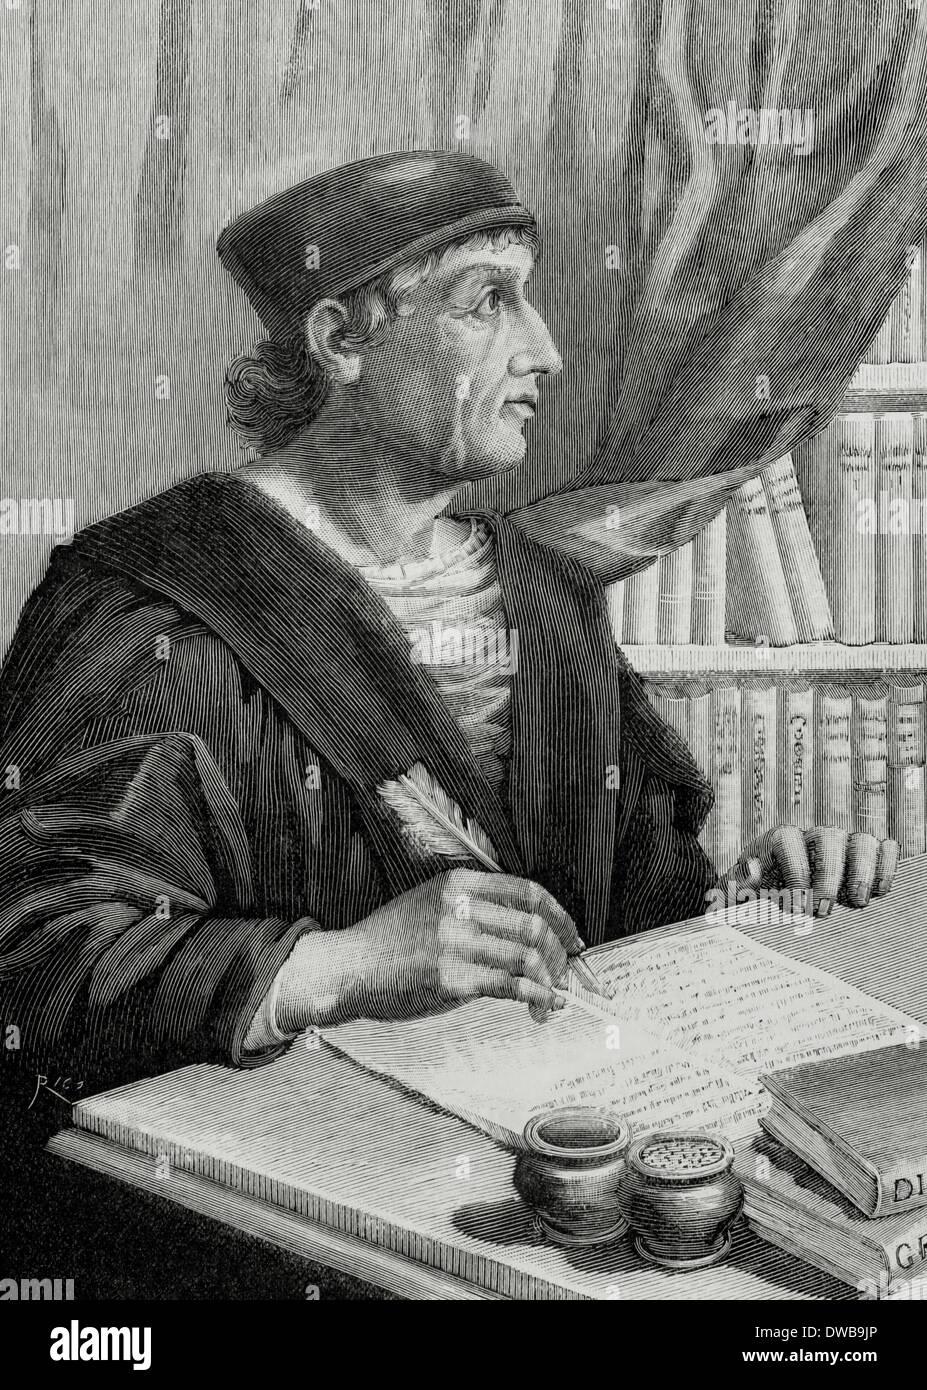 Antonio Nebrija (1441-1522). Spanish scholar, historian, teacher and poet. Engraving. - Stock Image